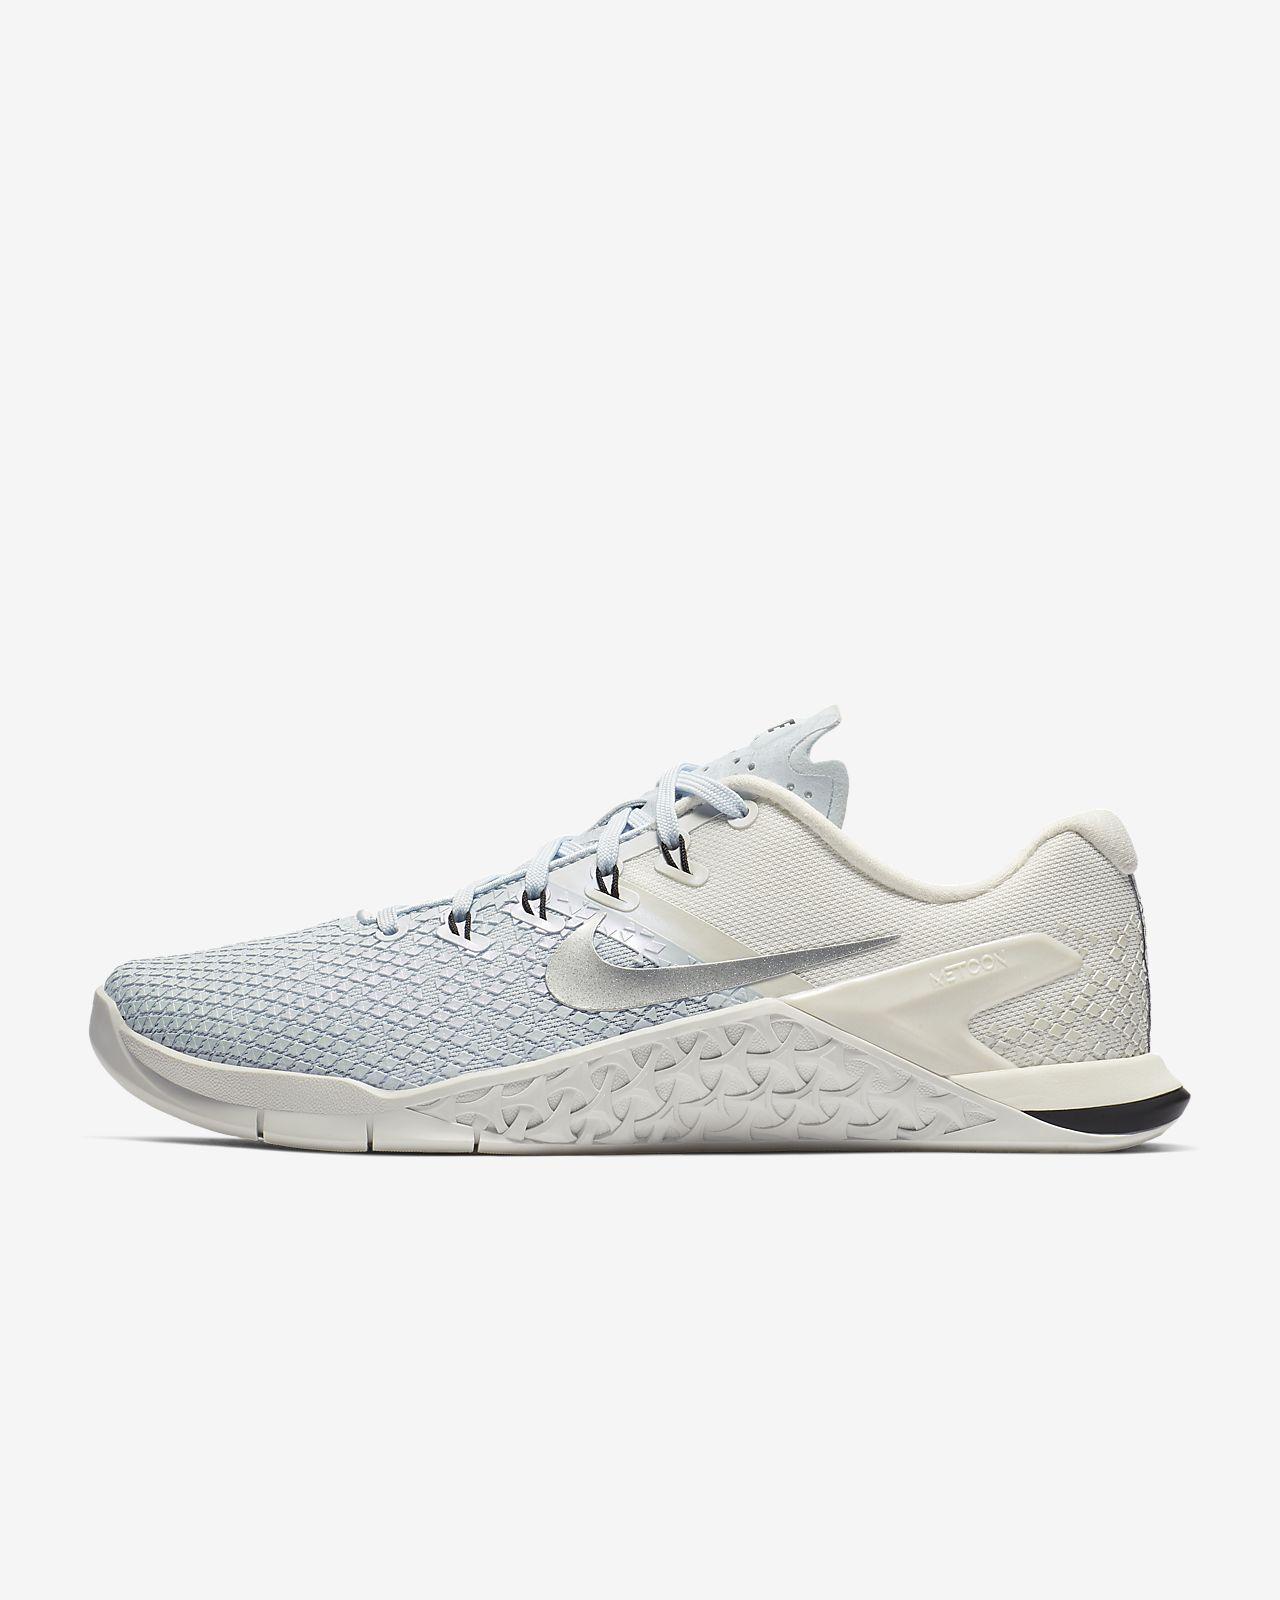 buy popular 55f65 11653 ... Chaussure de cross-training et de renforcement musculaire Nike Metcon 4  XD Metallic pour Femme